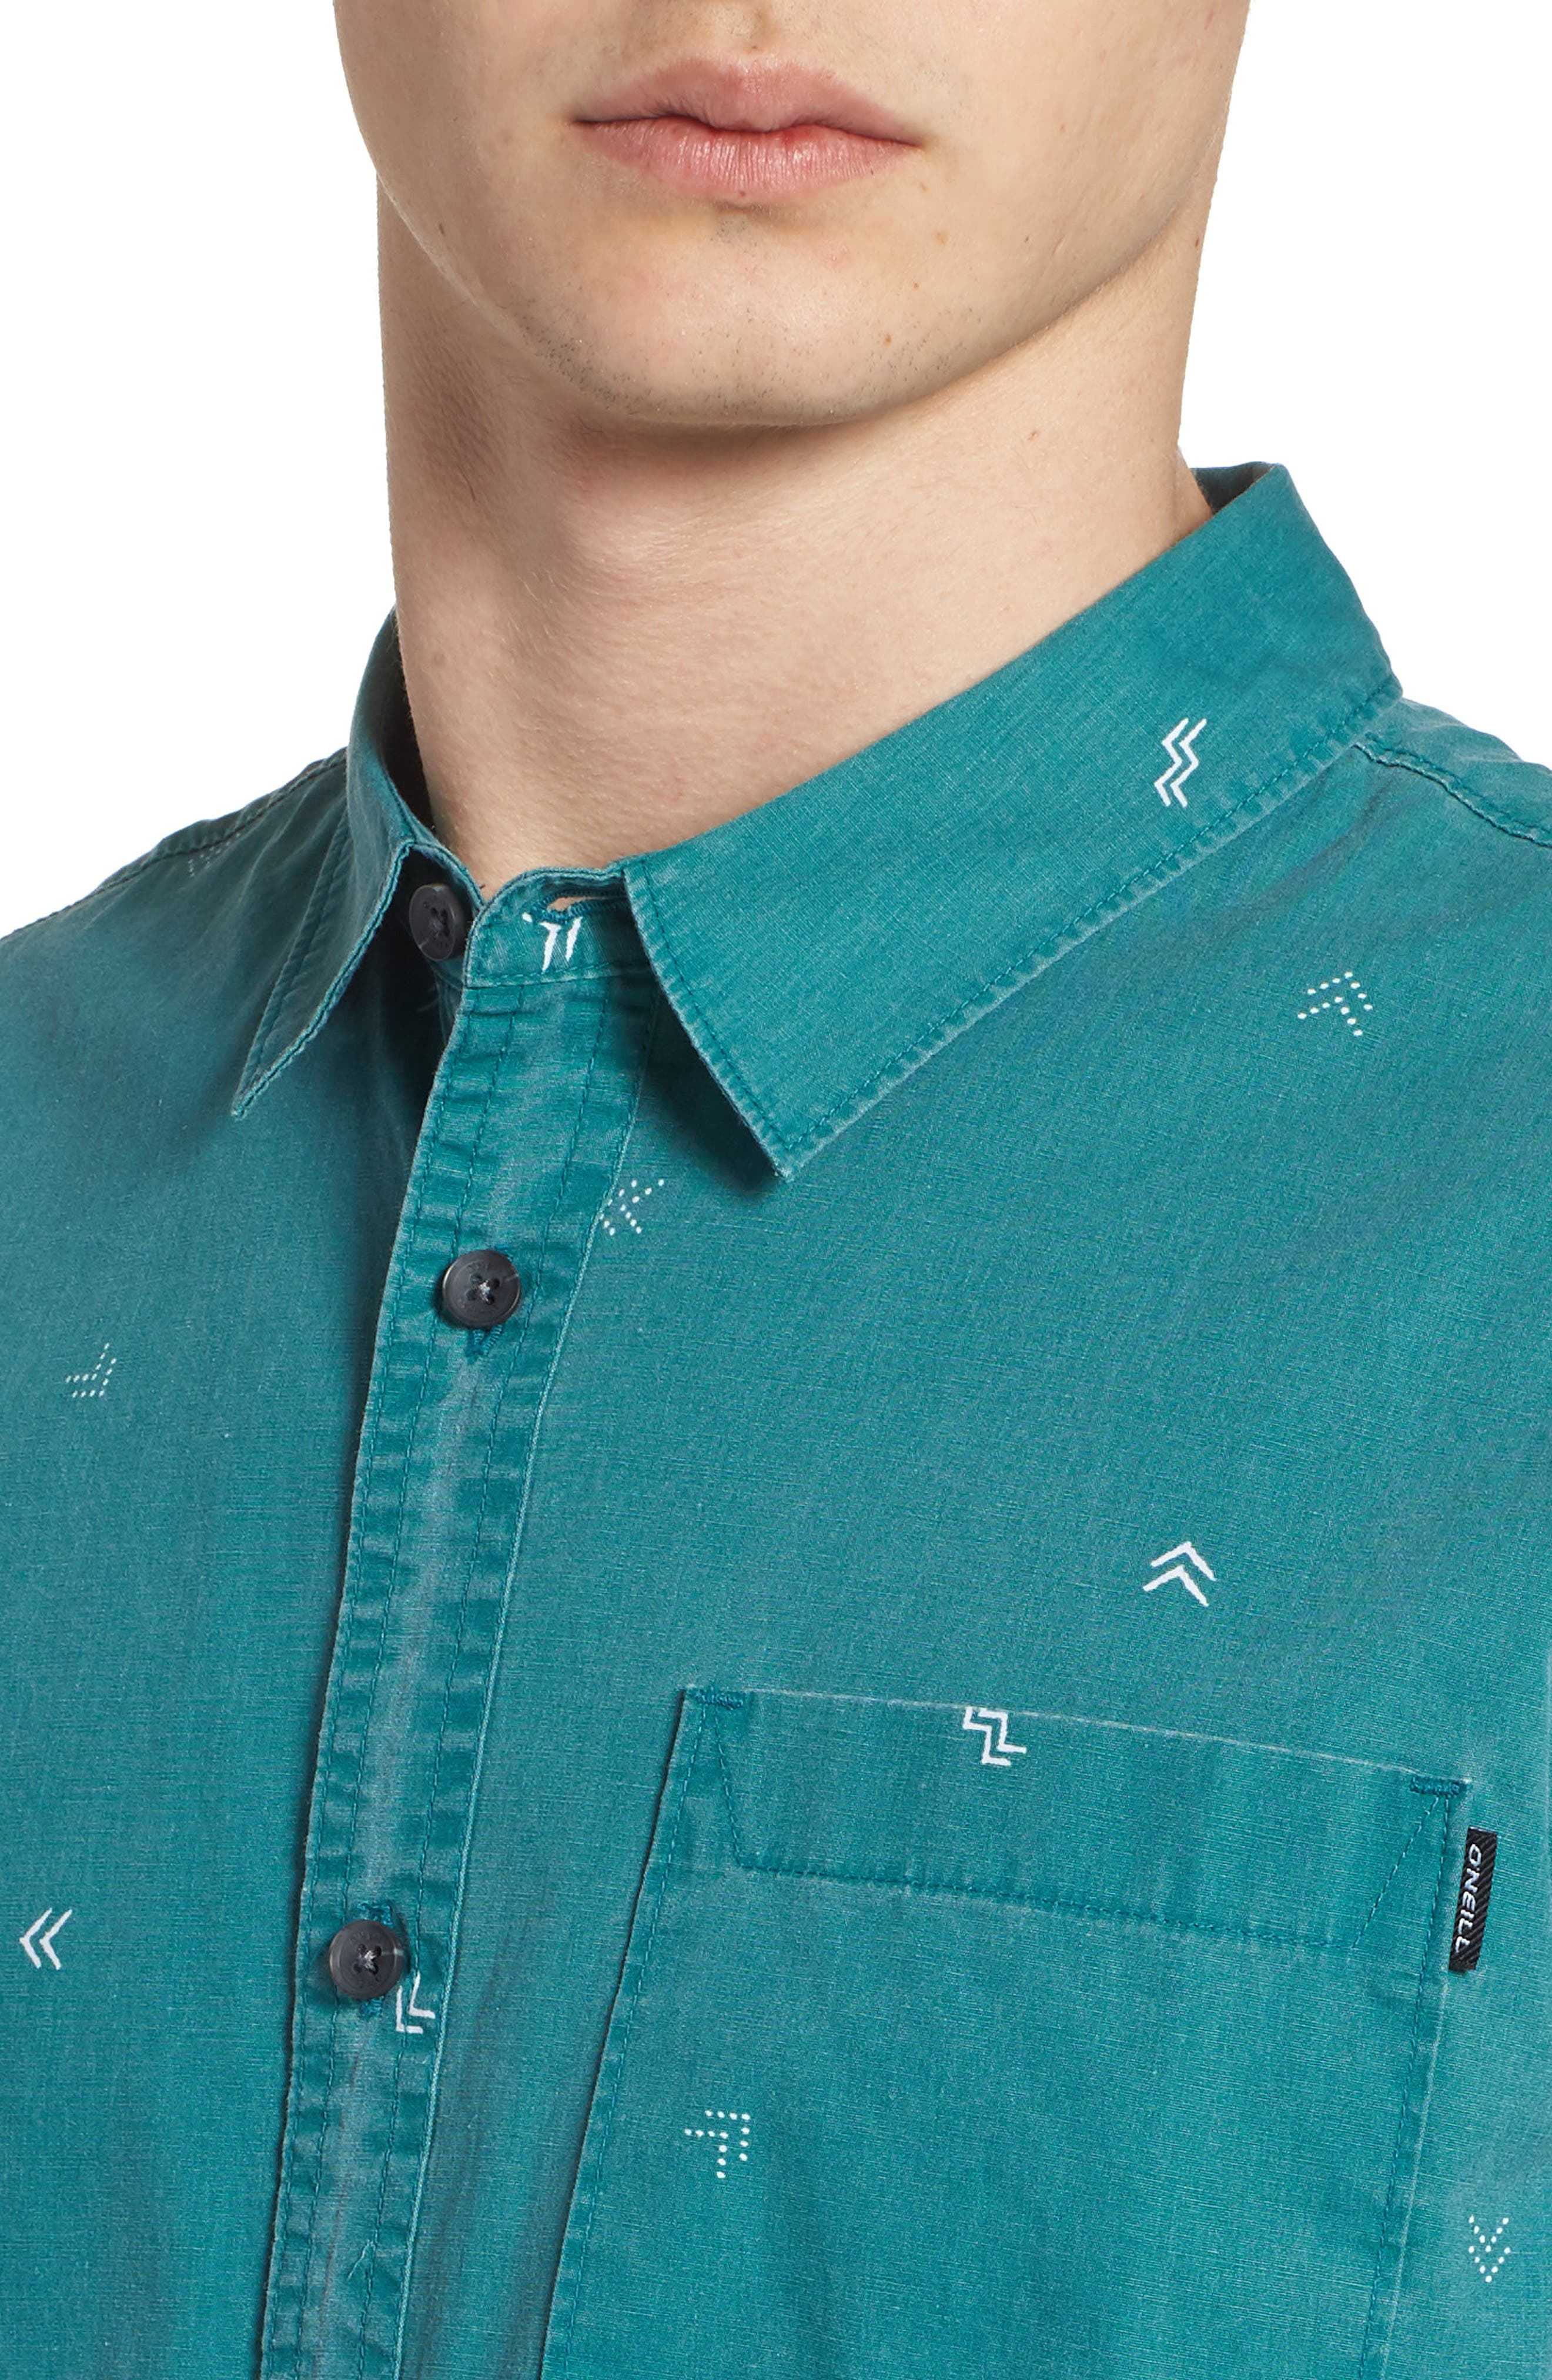 Kruger Woven Shirt,                             Alternate thumbnail 4, color,                             JADE